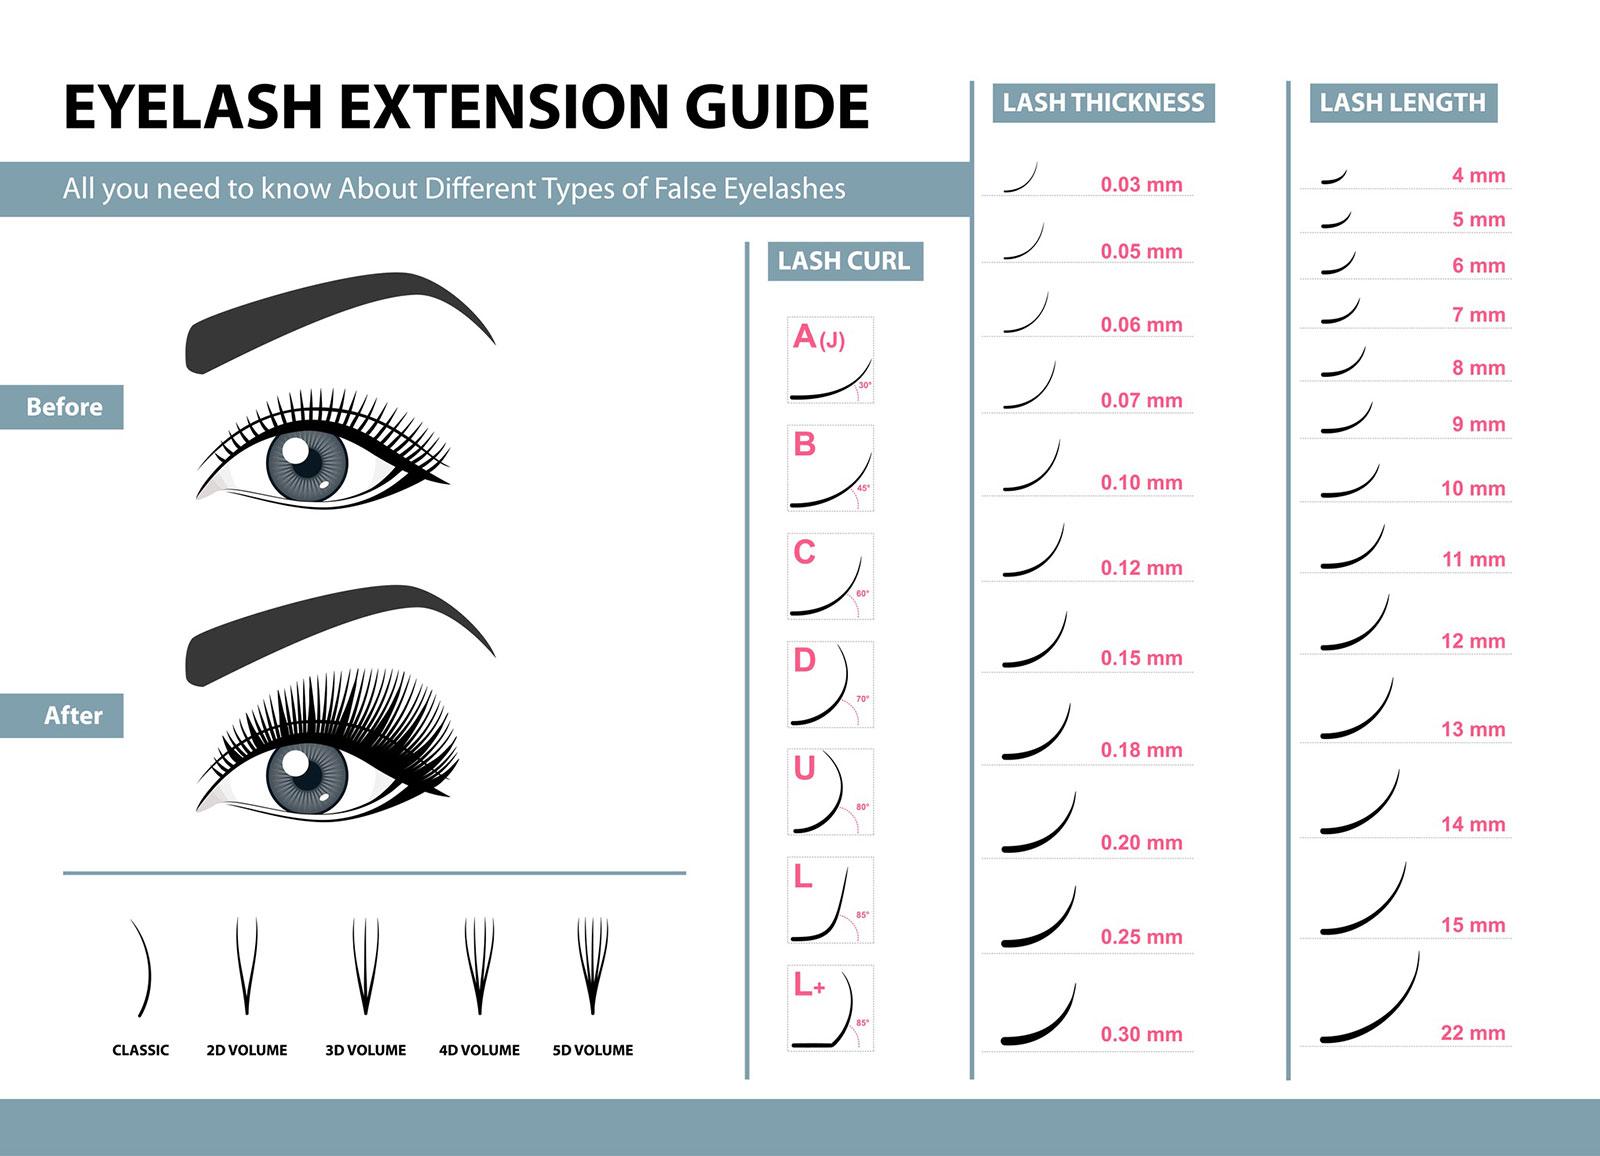 Eyelash Extensions Guide